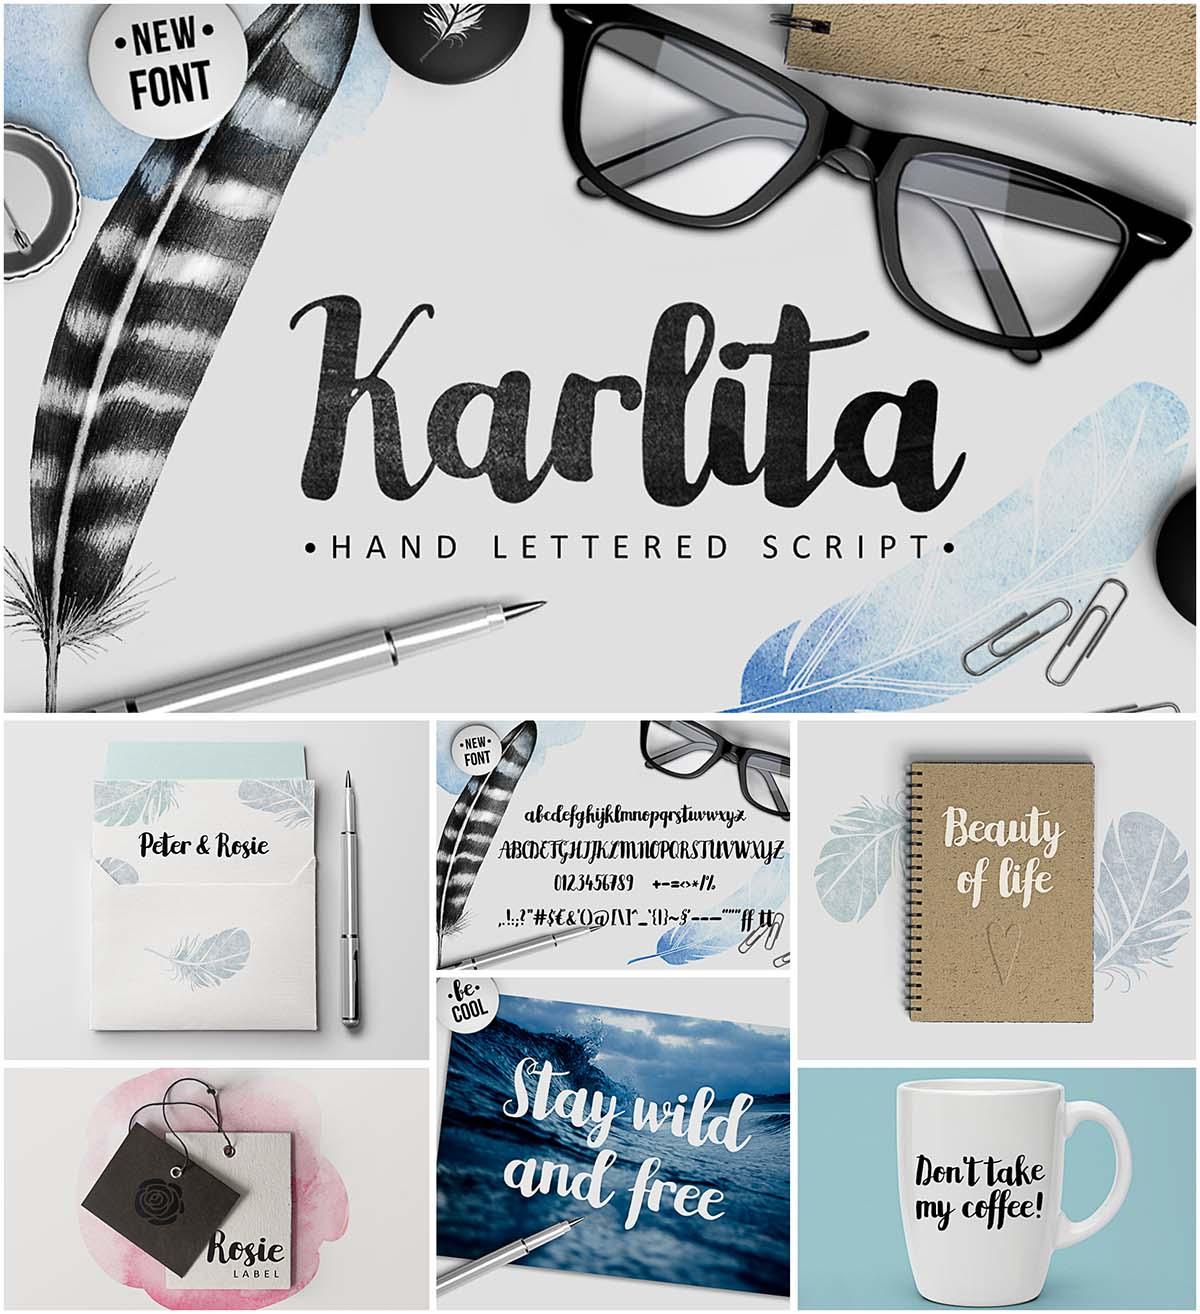 Karlita calligraphy script